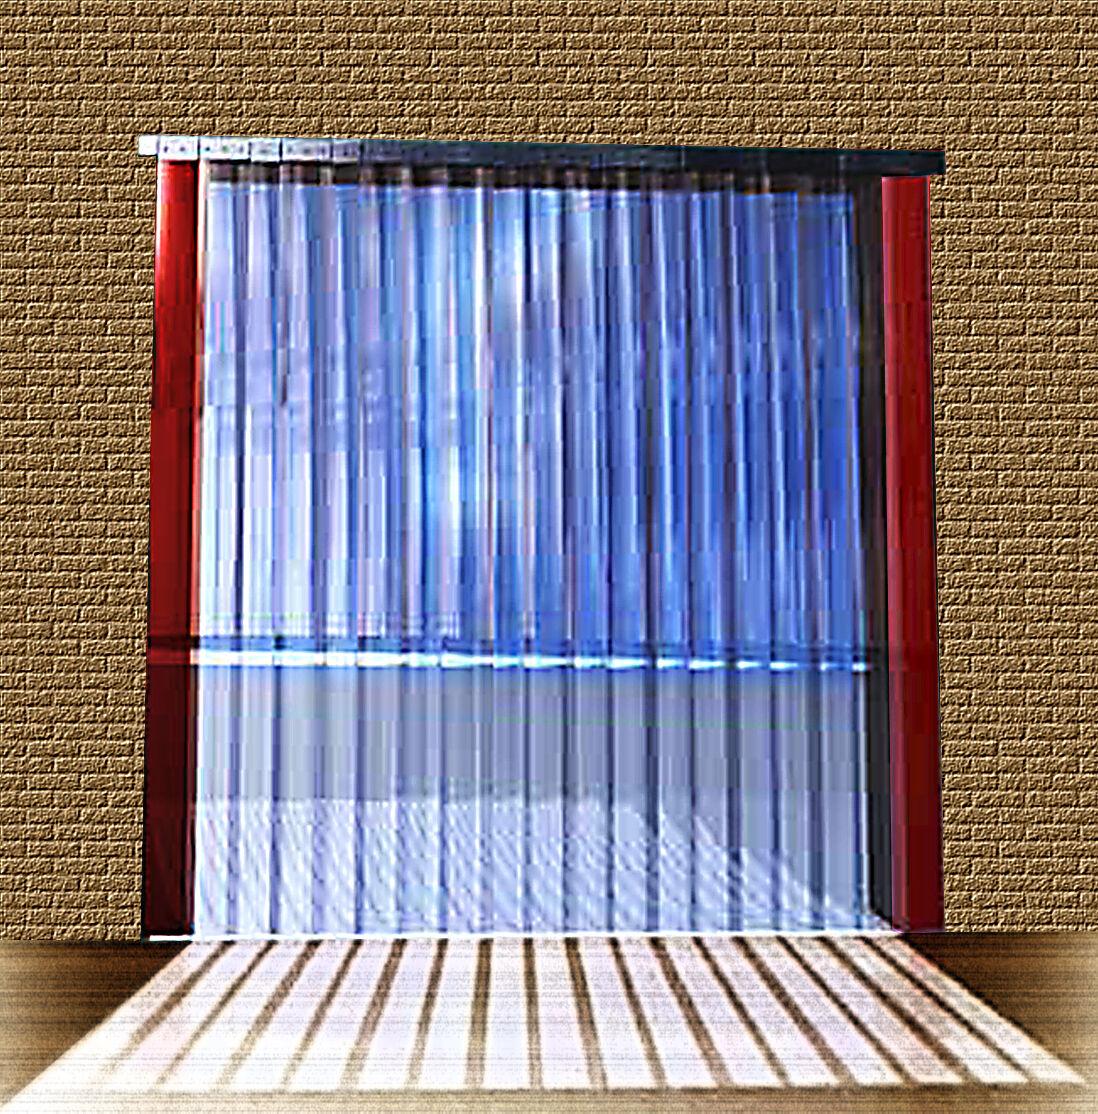 B 0 85m 85m 85m x H3 00m Lamellen PVC Streifen Vorhang 200x2mm 05592f